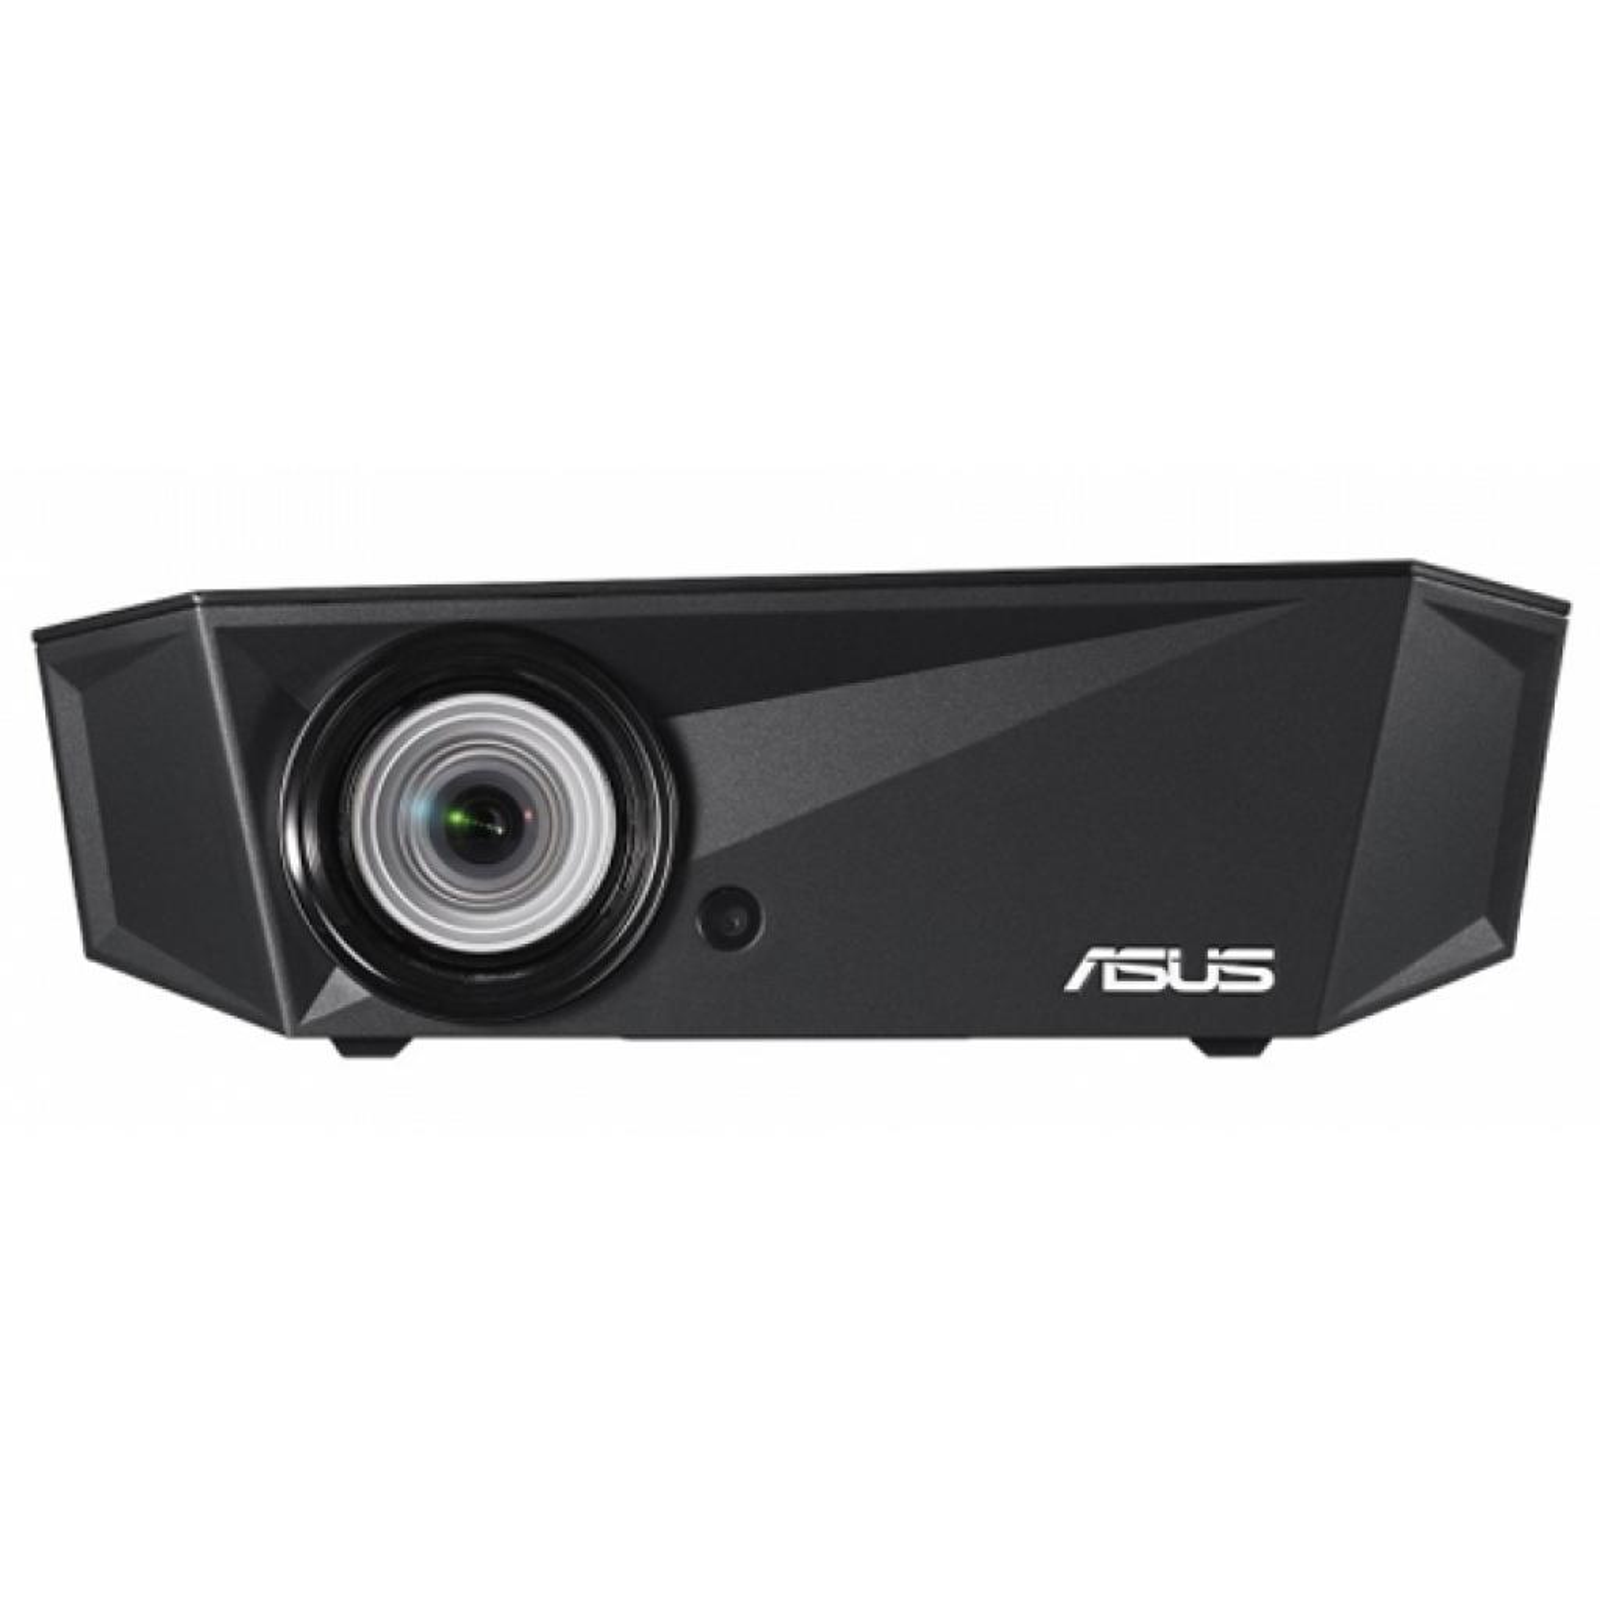 Проектор ASUS F1 (90LJ00B0-B00520) изображение 8